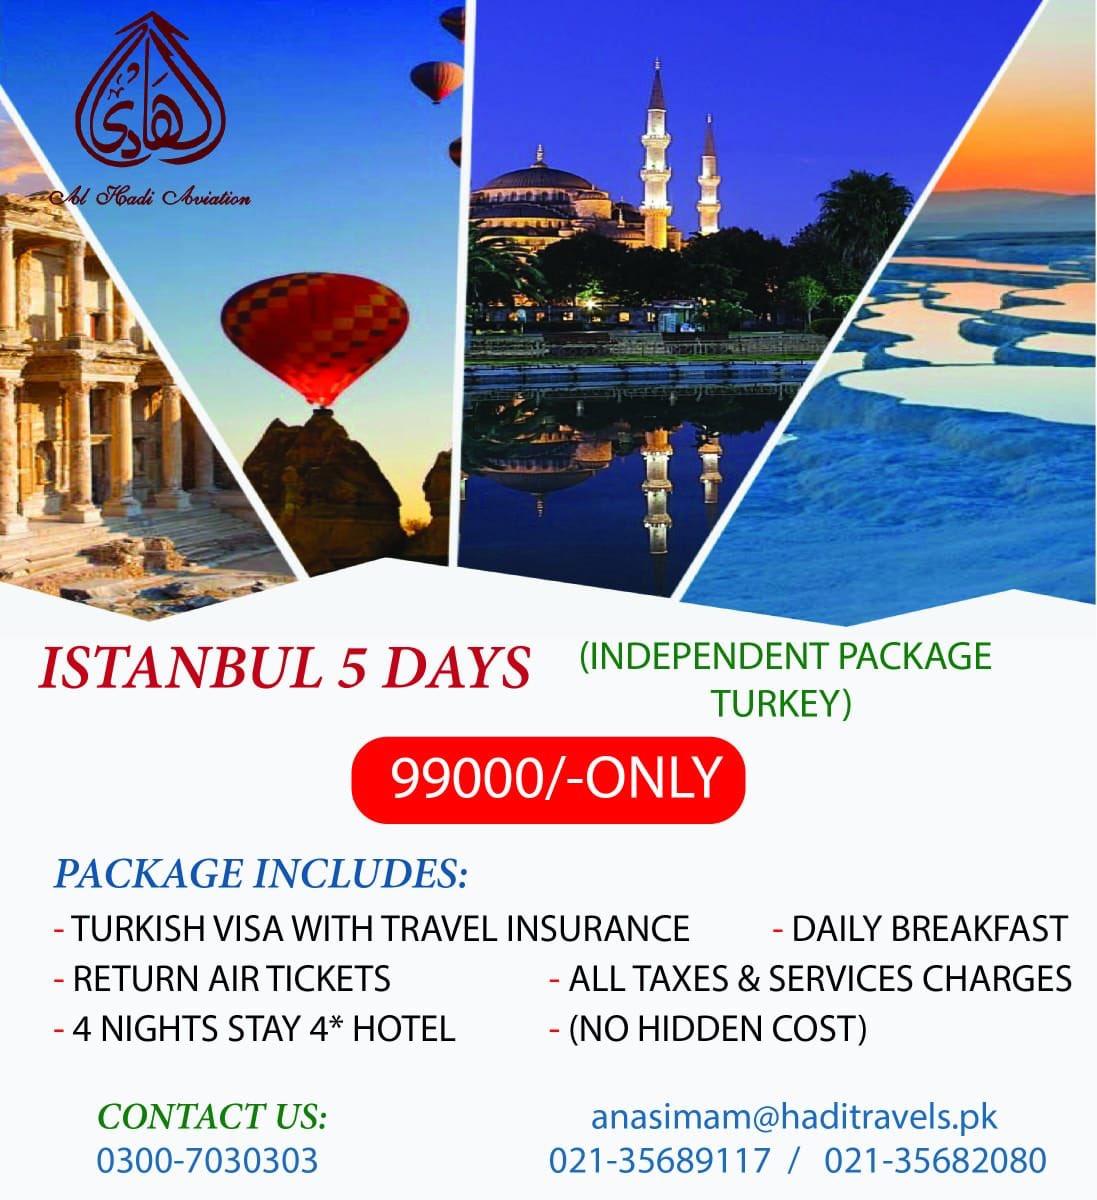 Turkey package #Turkey #visa #hotel #ticket #Enjoying #fun https://t.co/JqEFX3AUWA